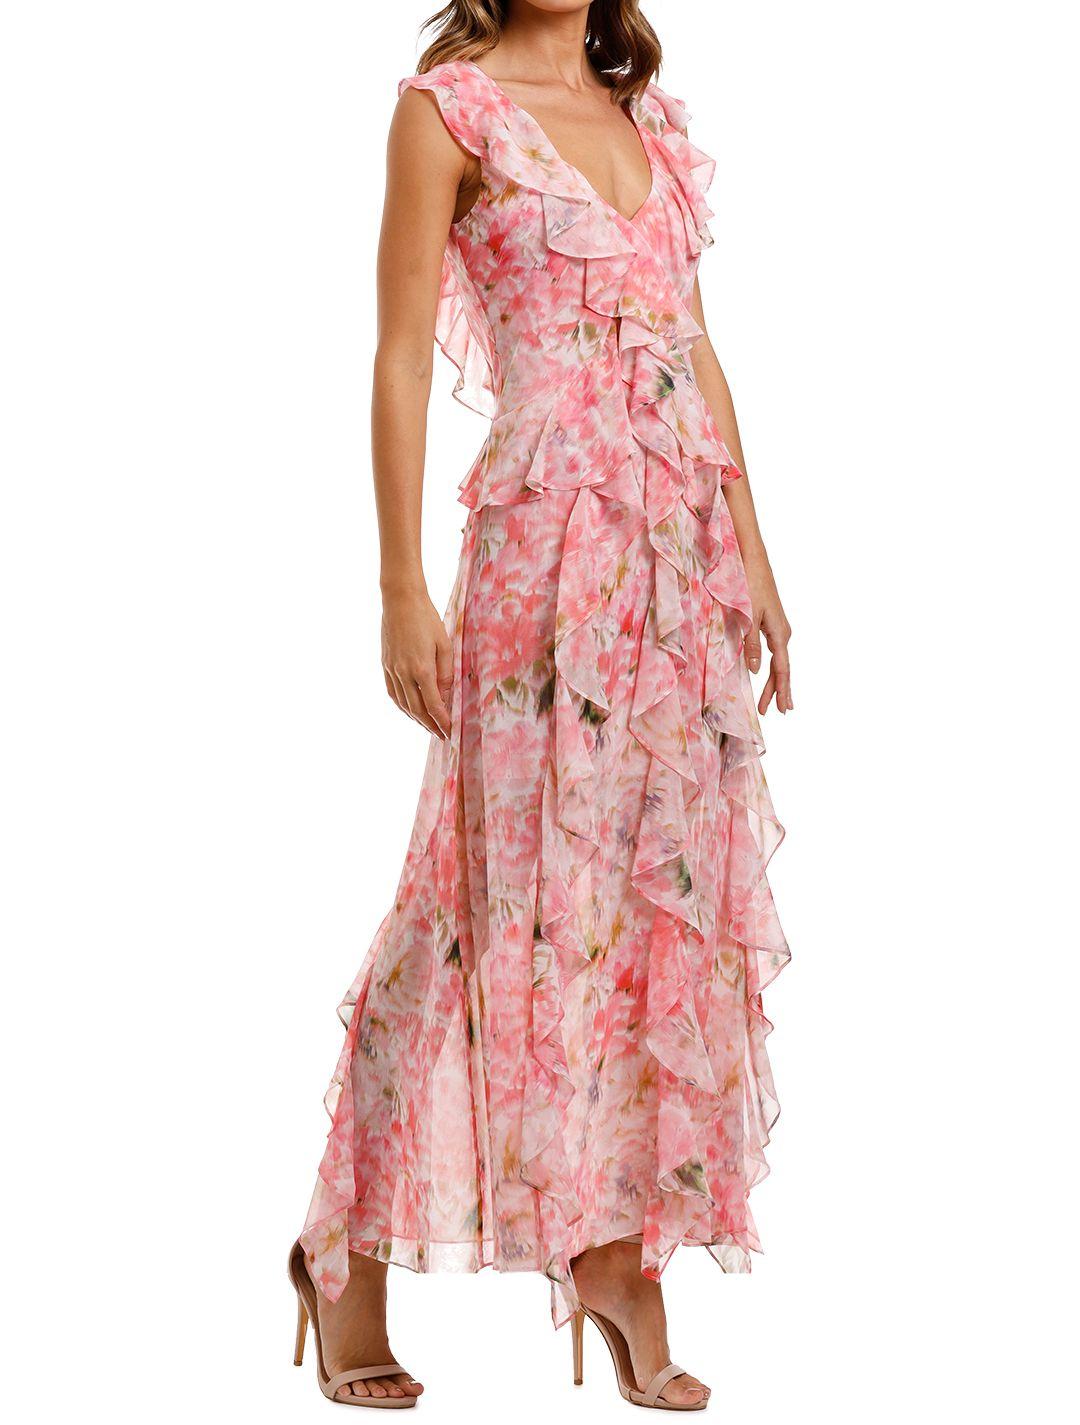 Misa LA Claudita Dress maxi sleeveless